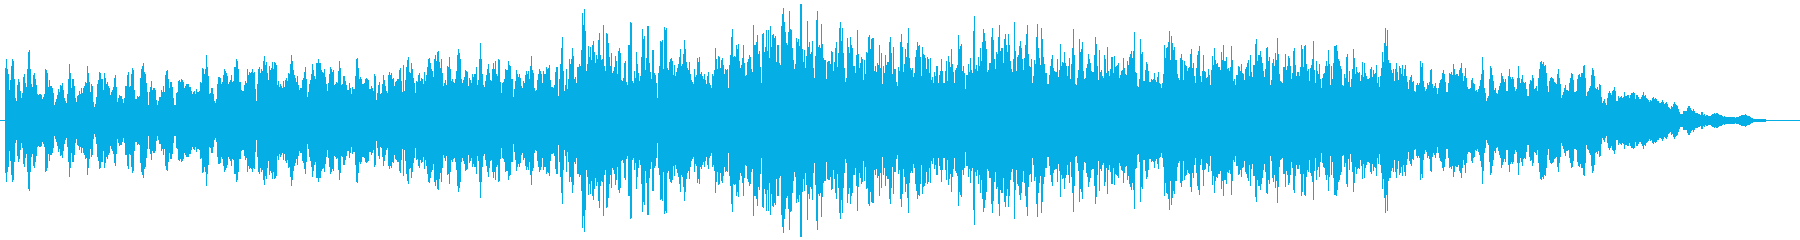 PADS 歌うガラス01の再生済みの波形